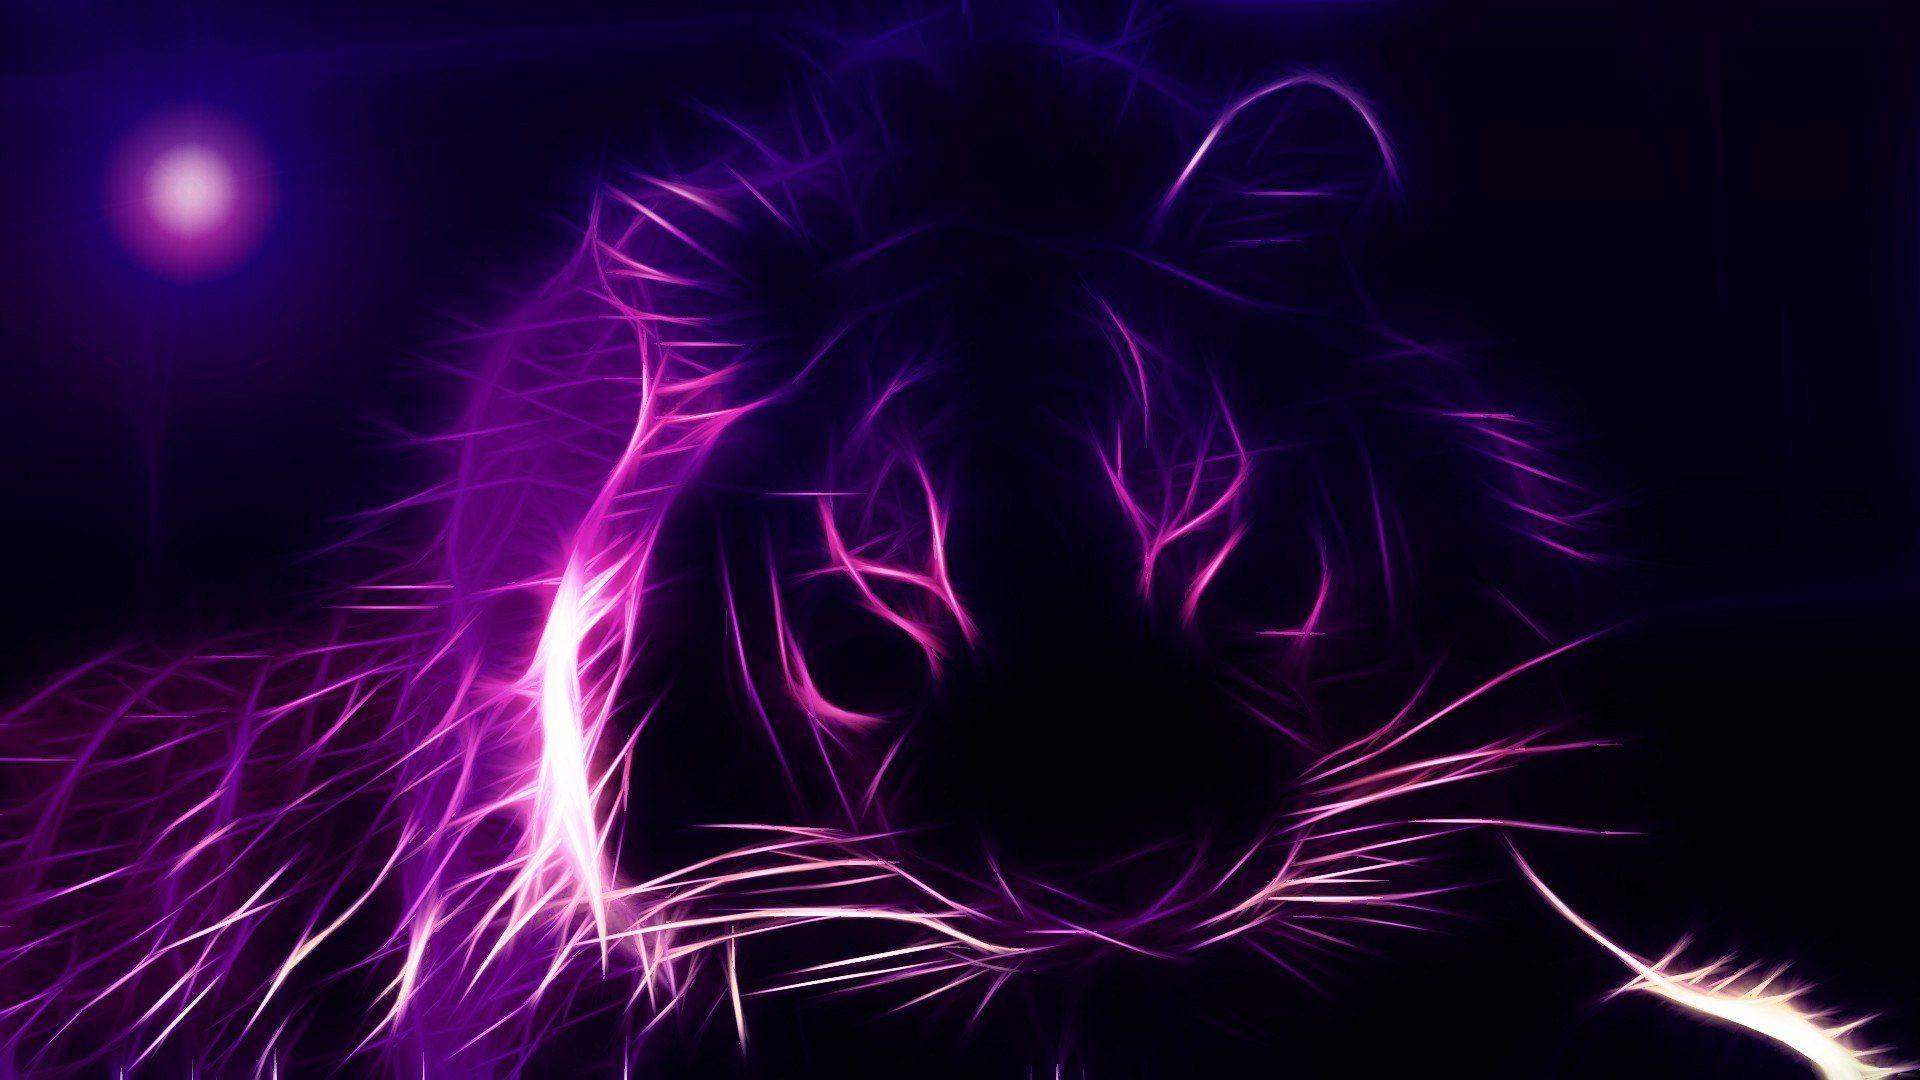 Neon Purple Wallpapers Top Free Neon Purple Backgrounds Wallpaperaccess